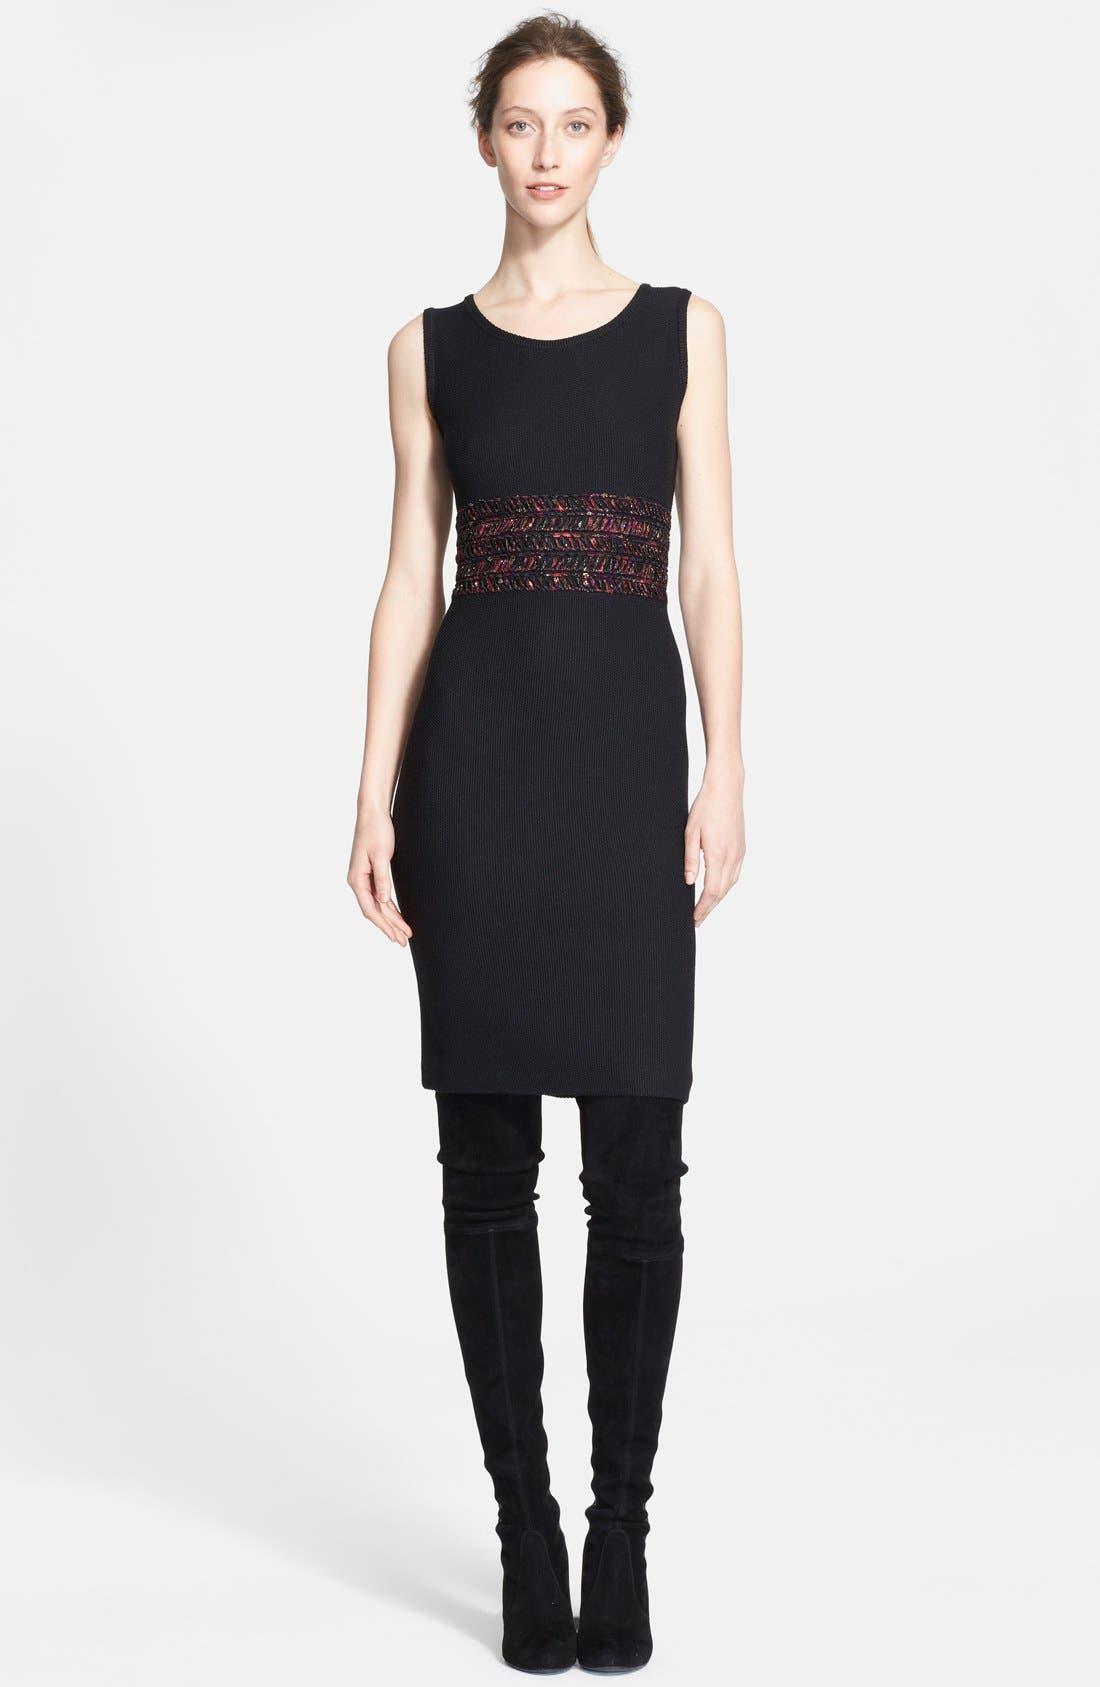 Main Image - St. John Collection Novelty Ribbon Knit Dress